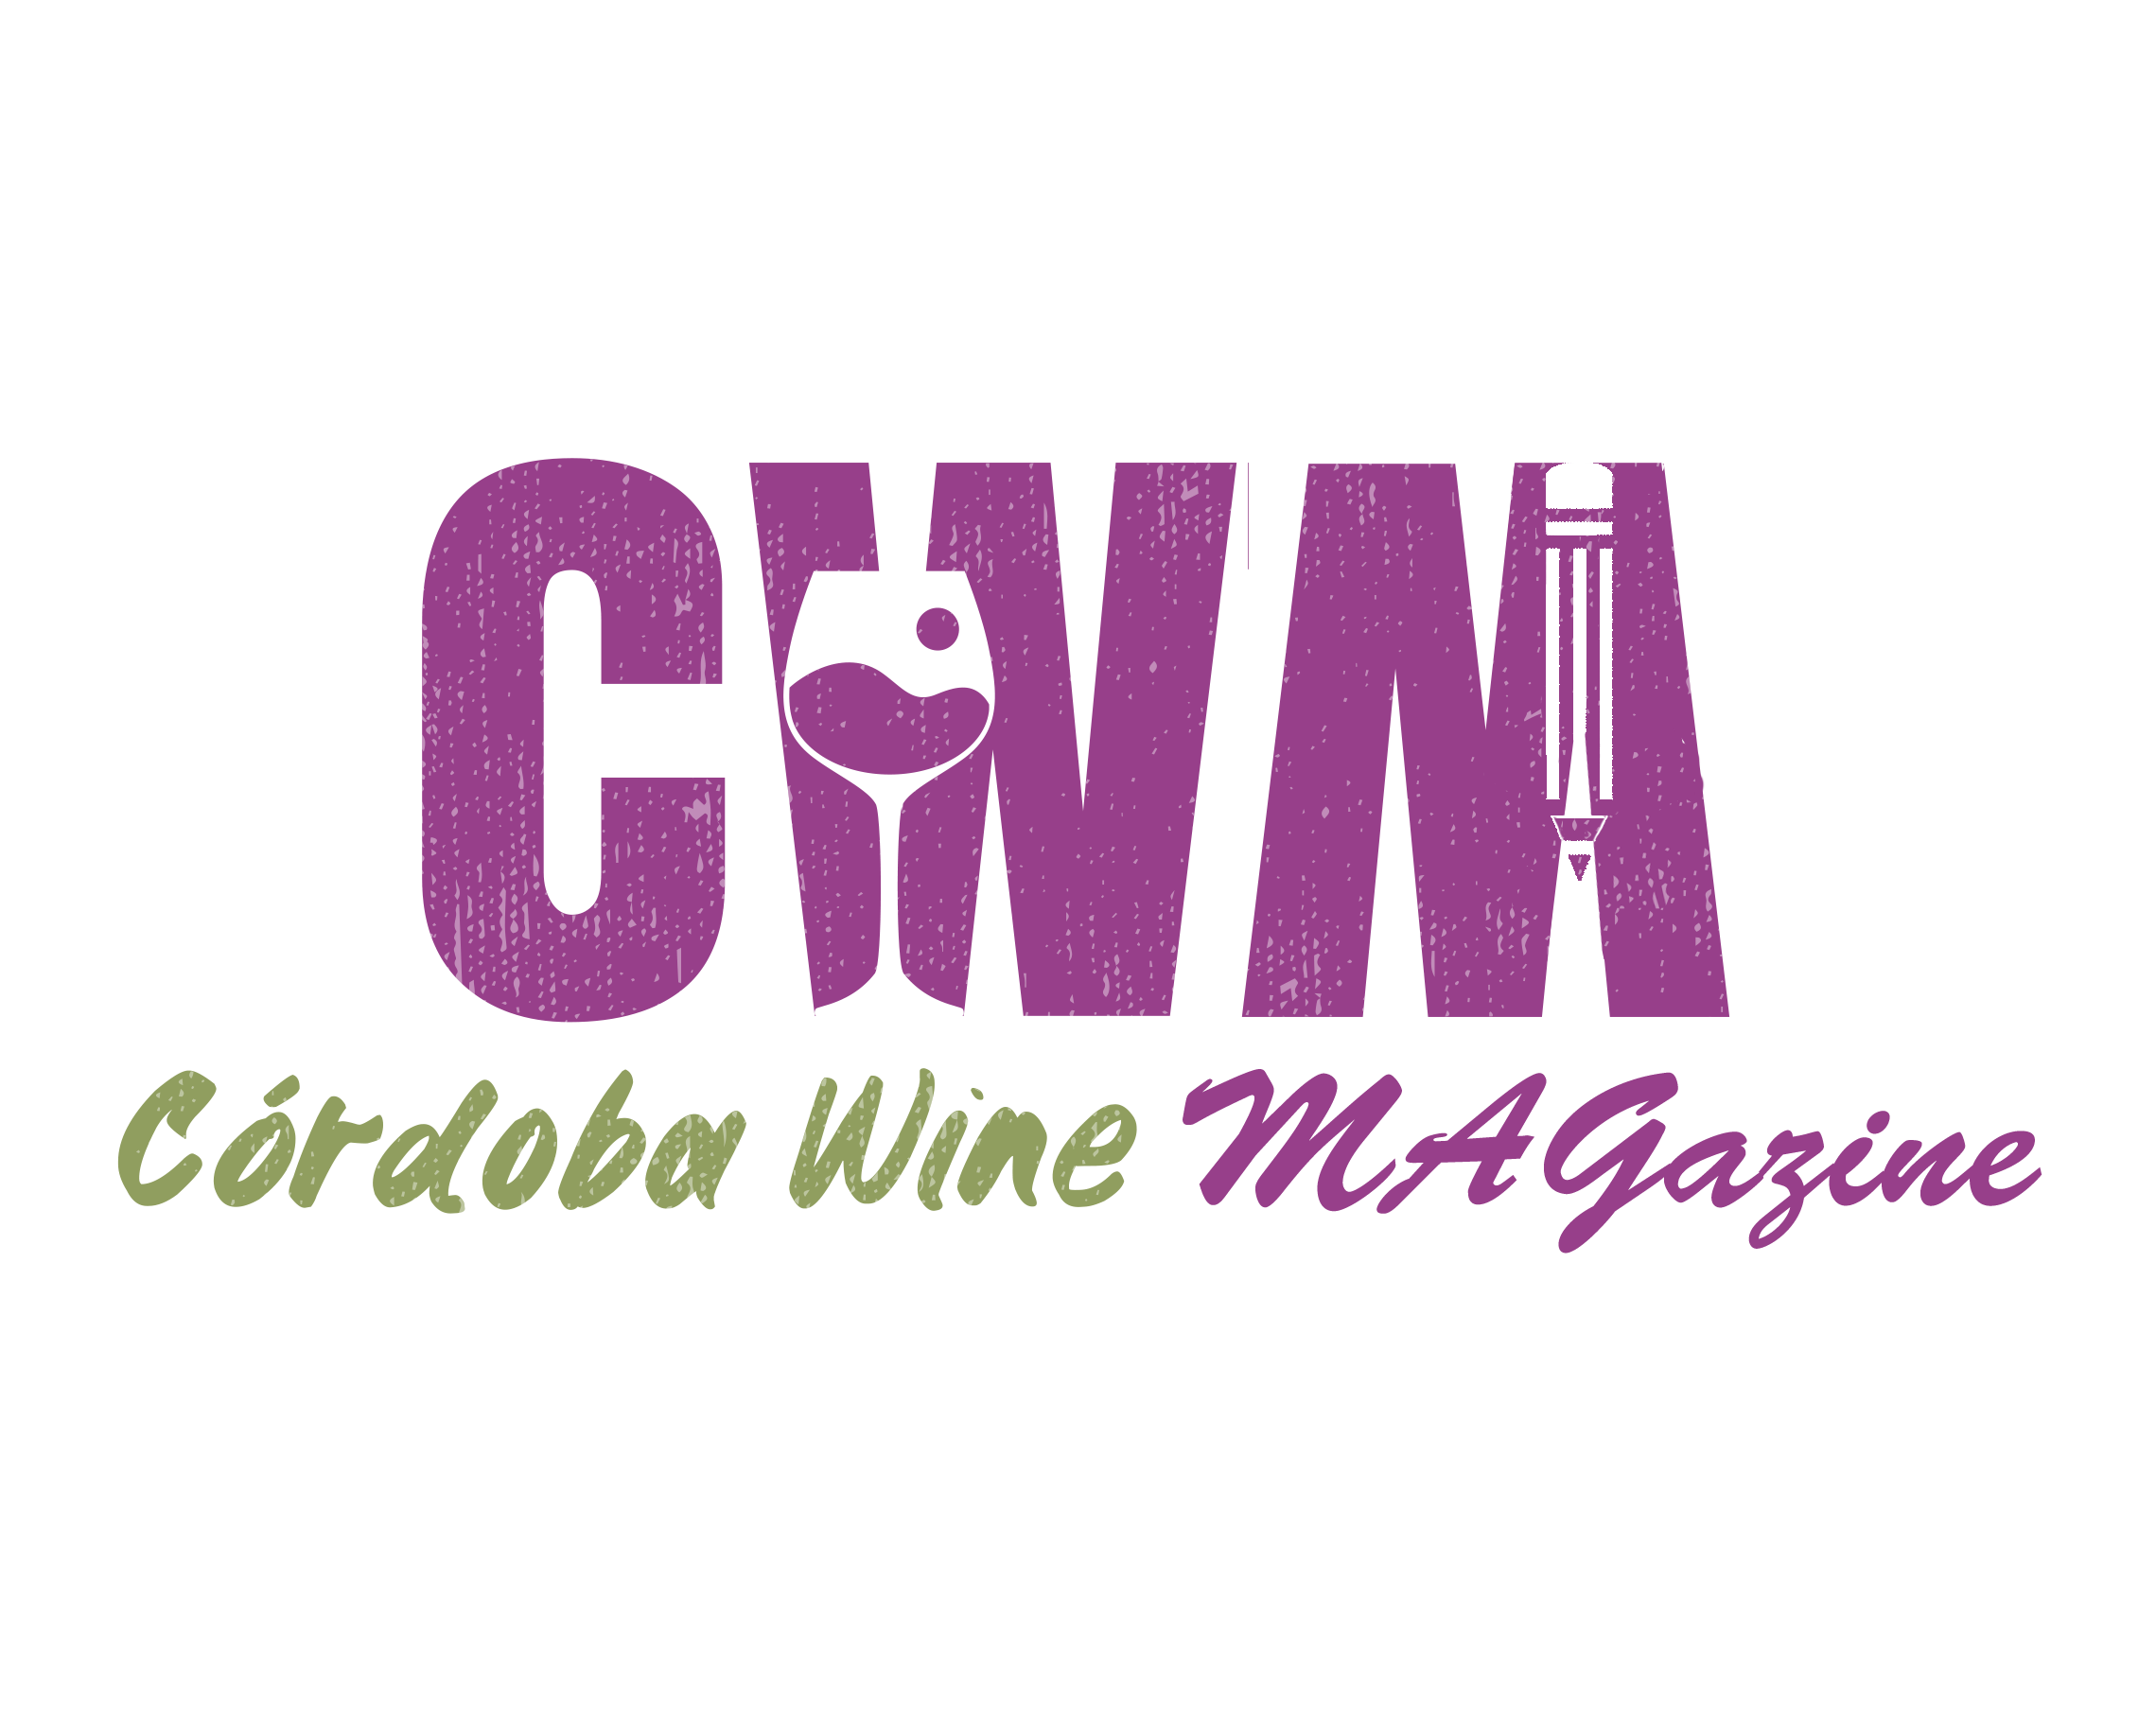 Córdoba Wine Magazine